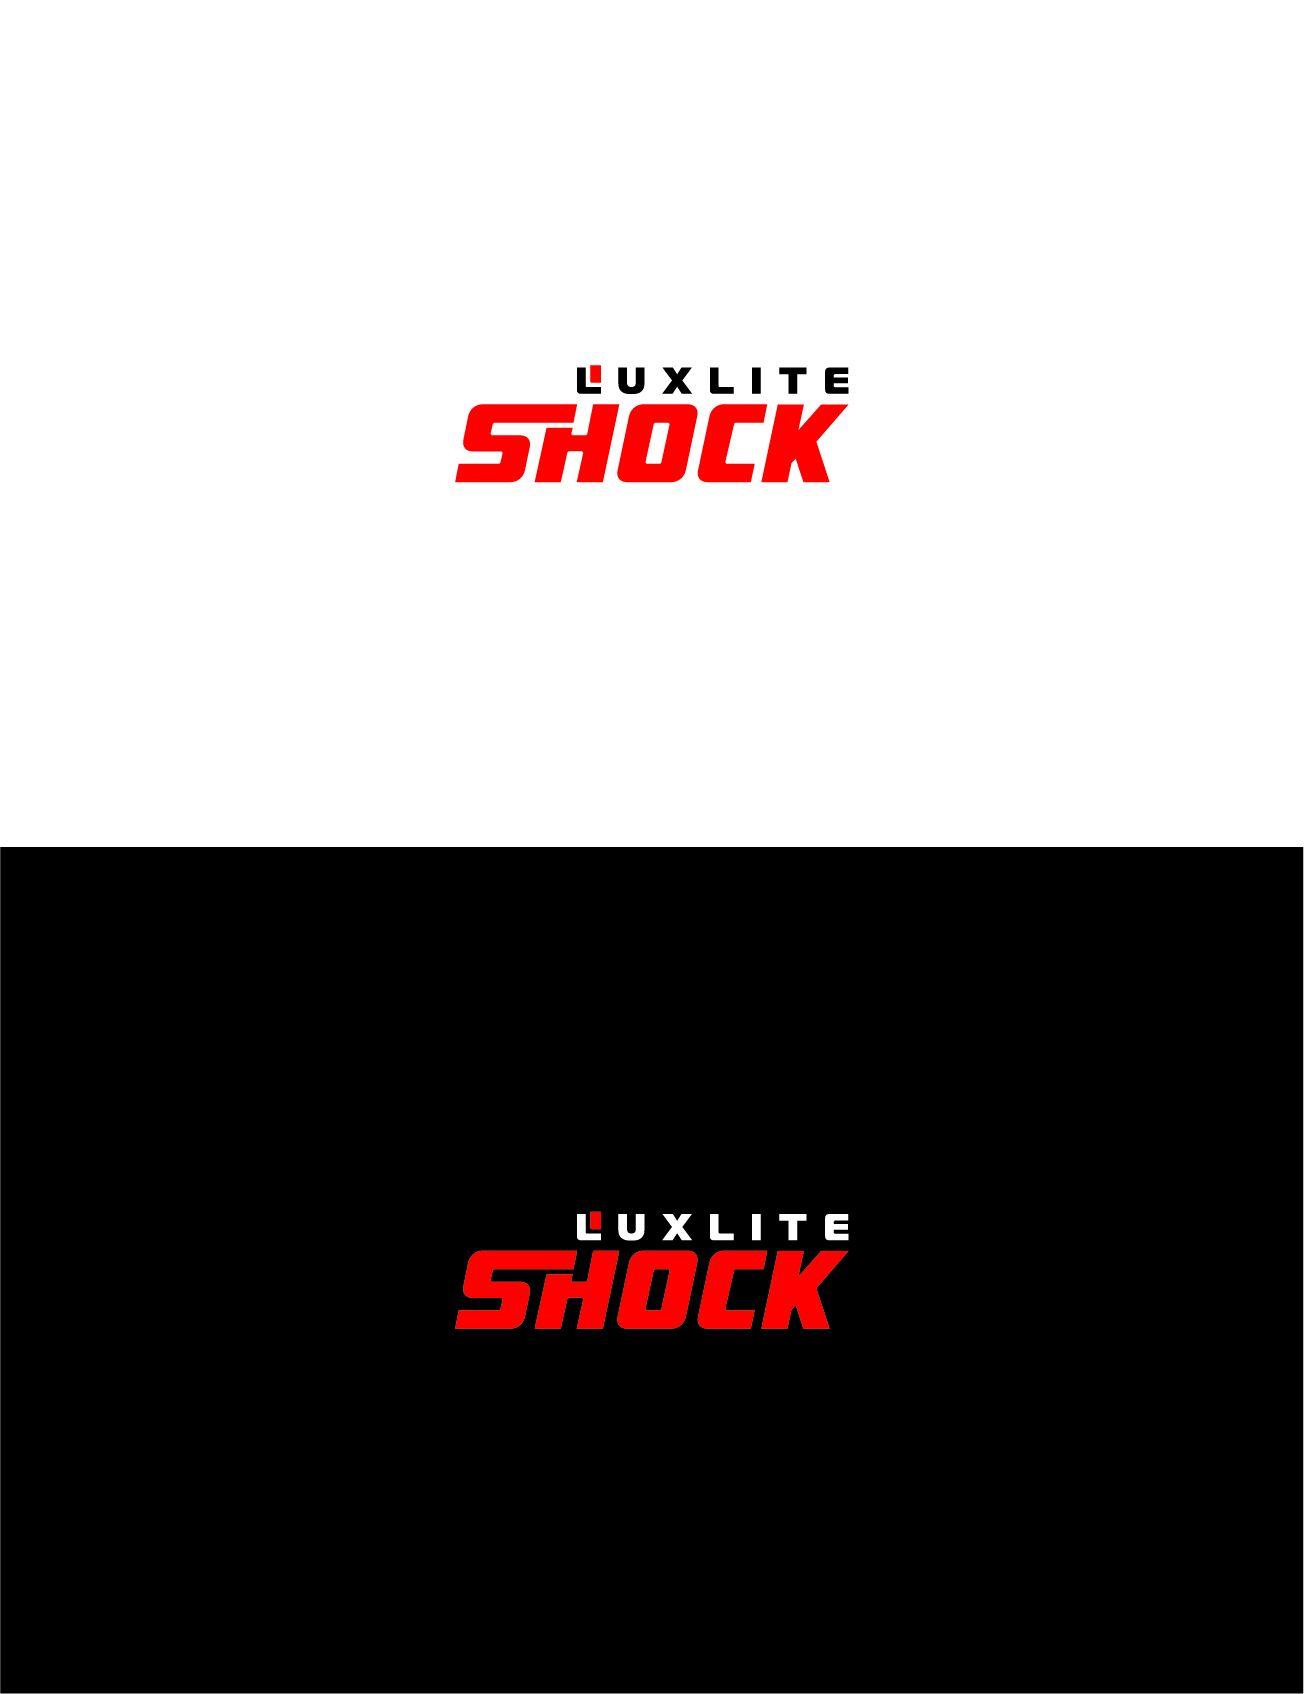 Логотип для батареек LUXLITE SHOCK - дизайнер andyul